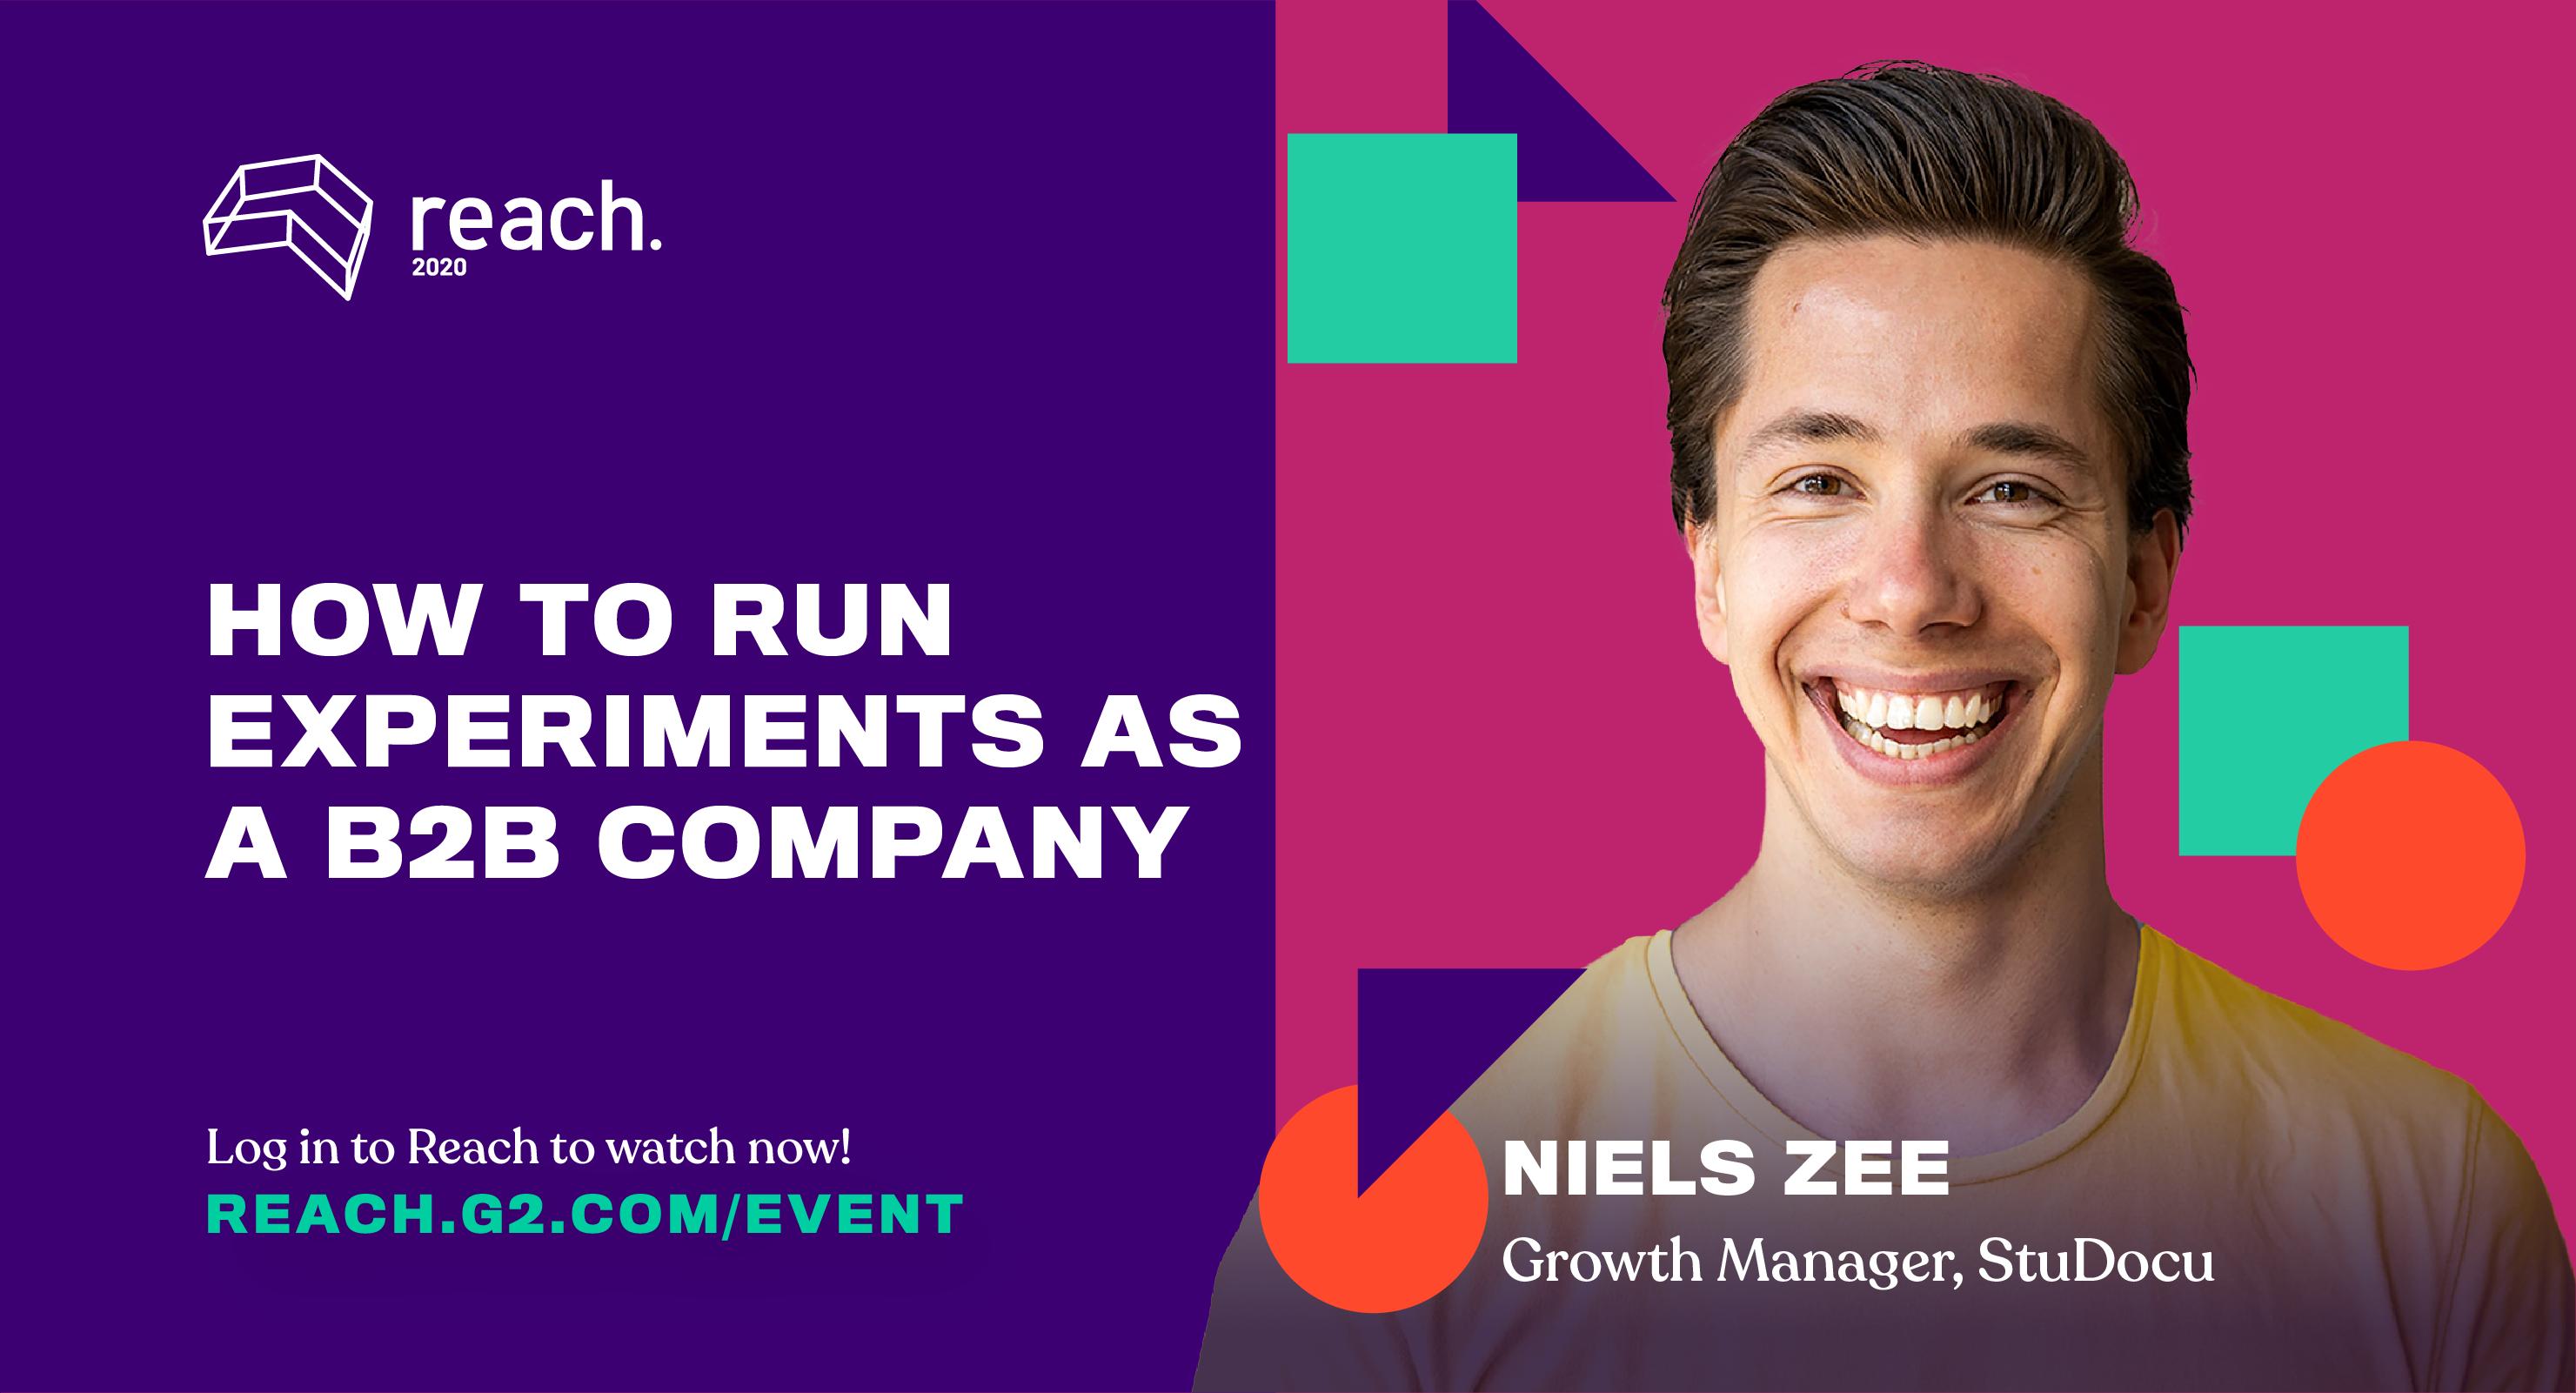 [Webinar] How to run experiments as a B2B company – G2 Reach 2020